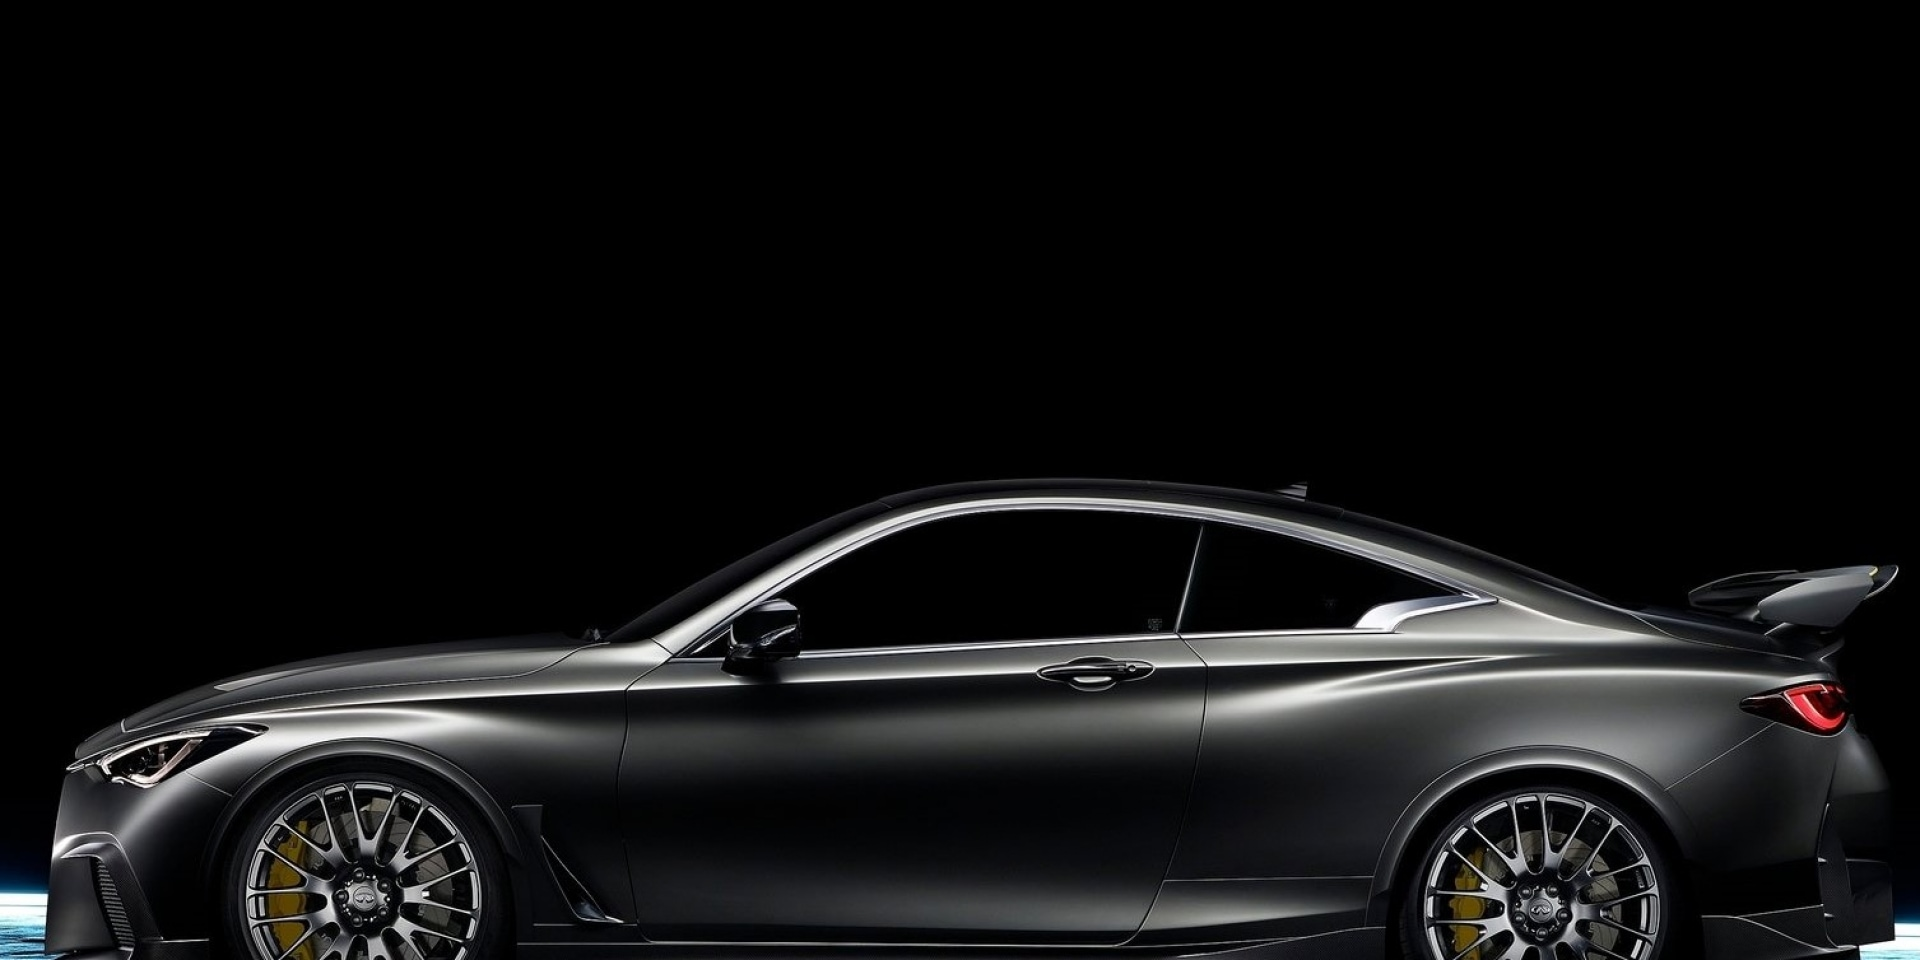 移植F1賽車引擎 INFINITI Q60 PROJECT Black S Concept